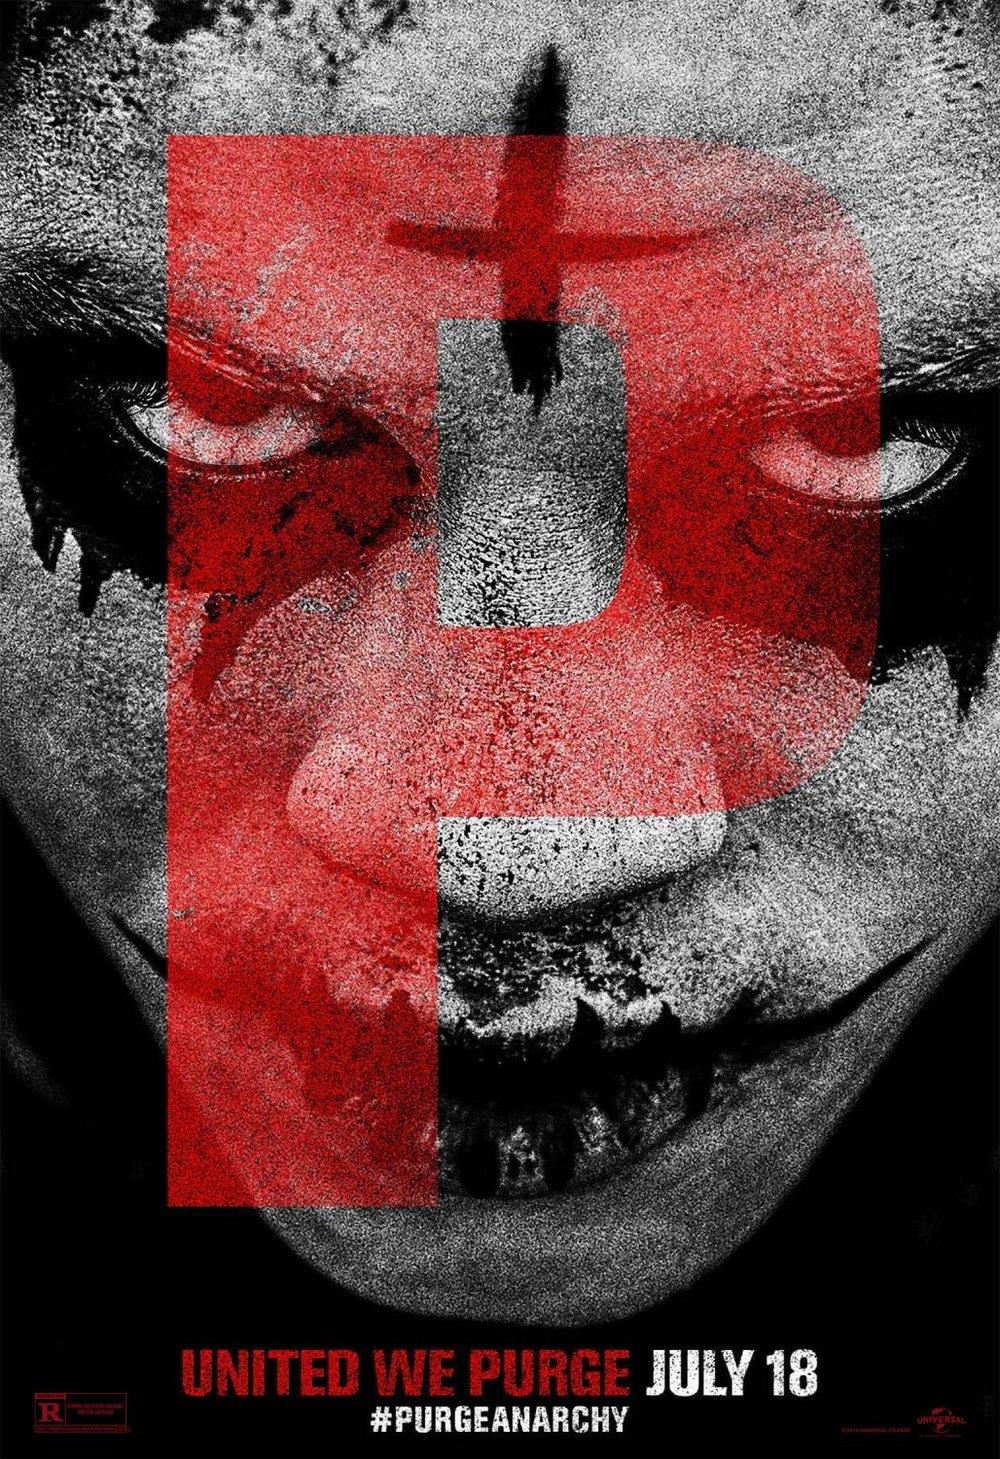 purge_anarchy_ver6_xlg.jpg